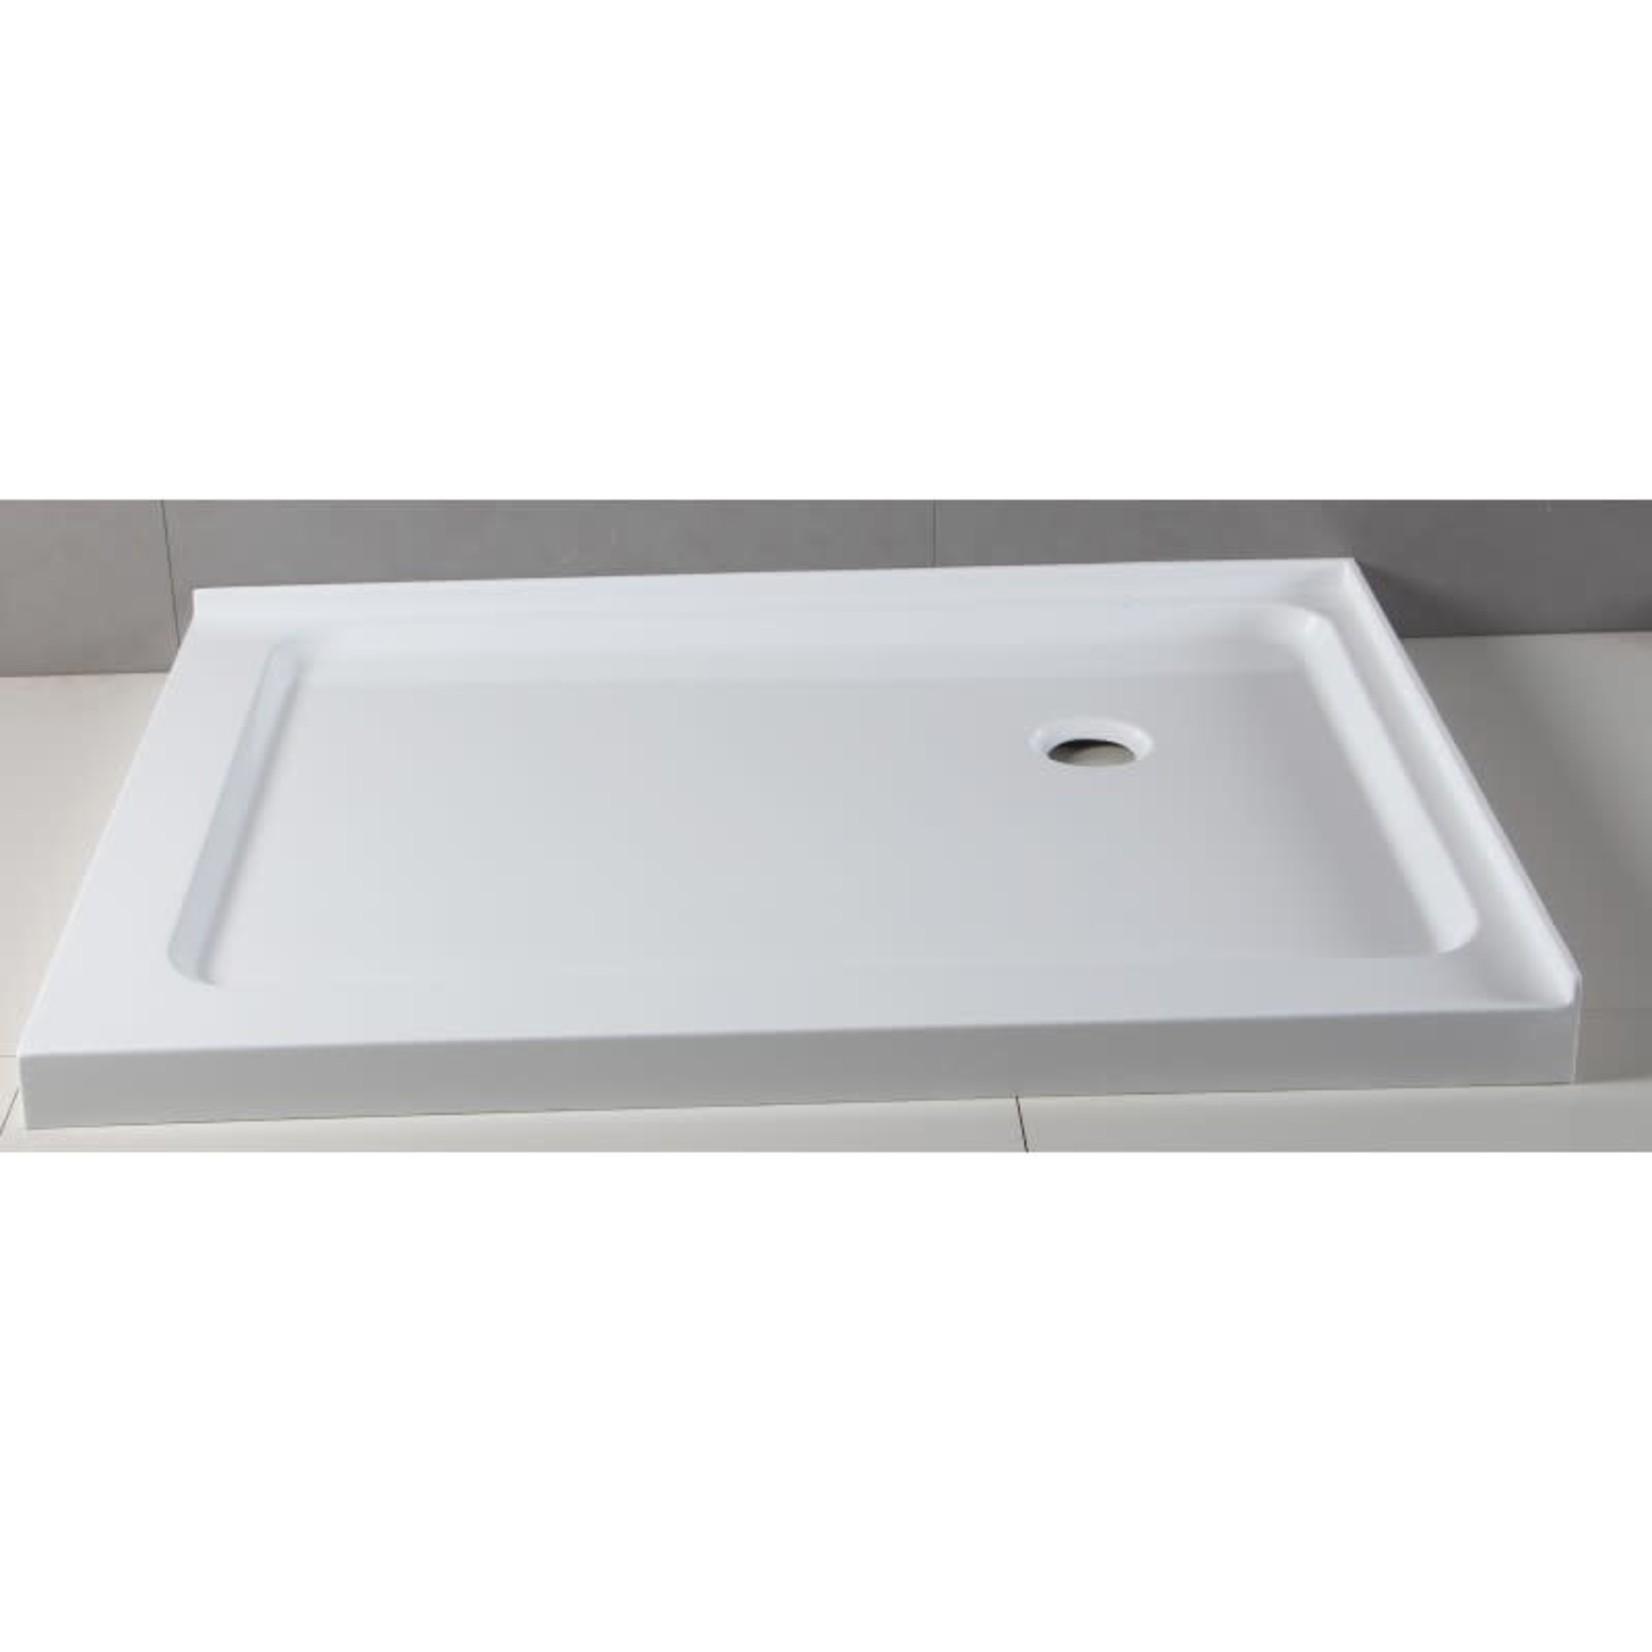 Shower base 36x48 drain at 12-12 Straight installation Apo DI